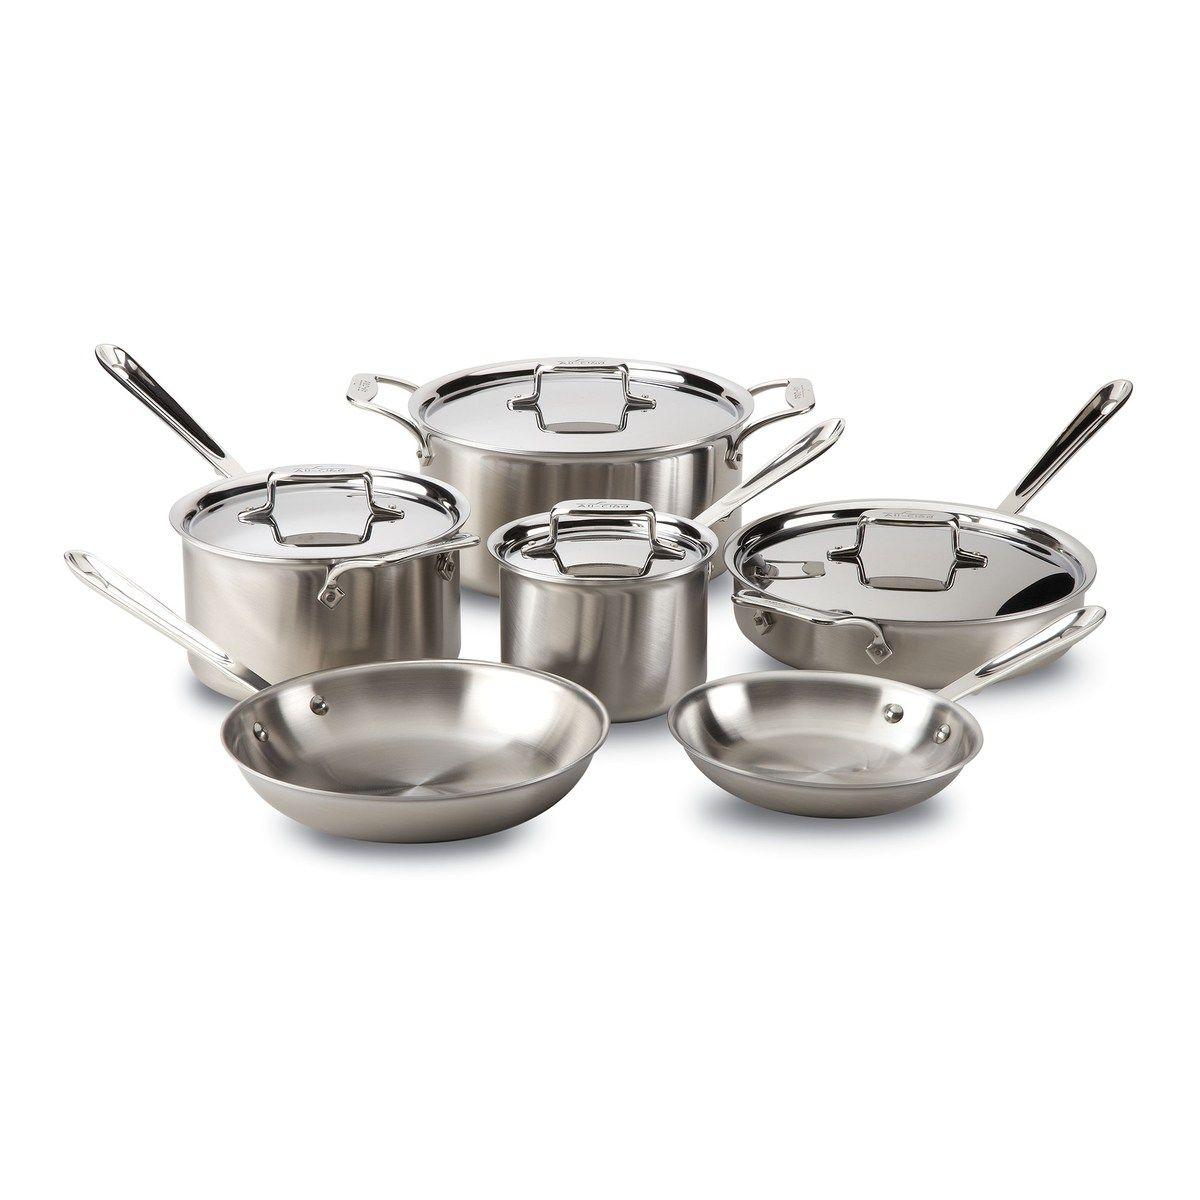 Batterie De Cuisine All Clad 10 Pieces D5 A 5 Plis In 2020 Dishwasher Safe Cookware Cookware Set Stainless Steel Safest Cookware